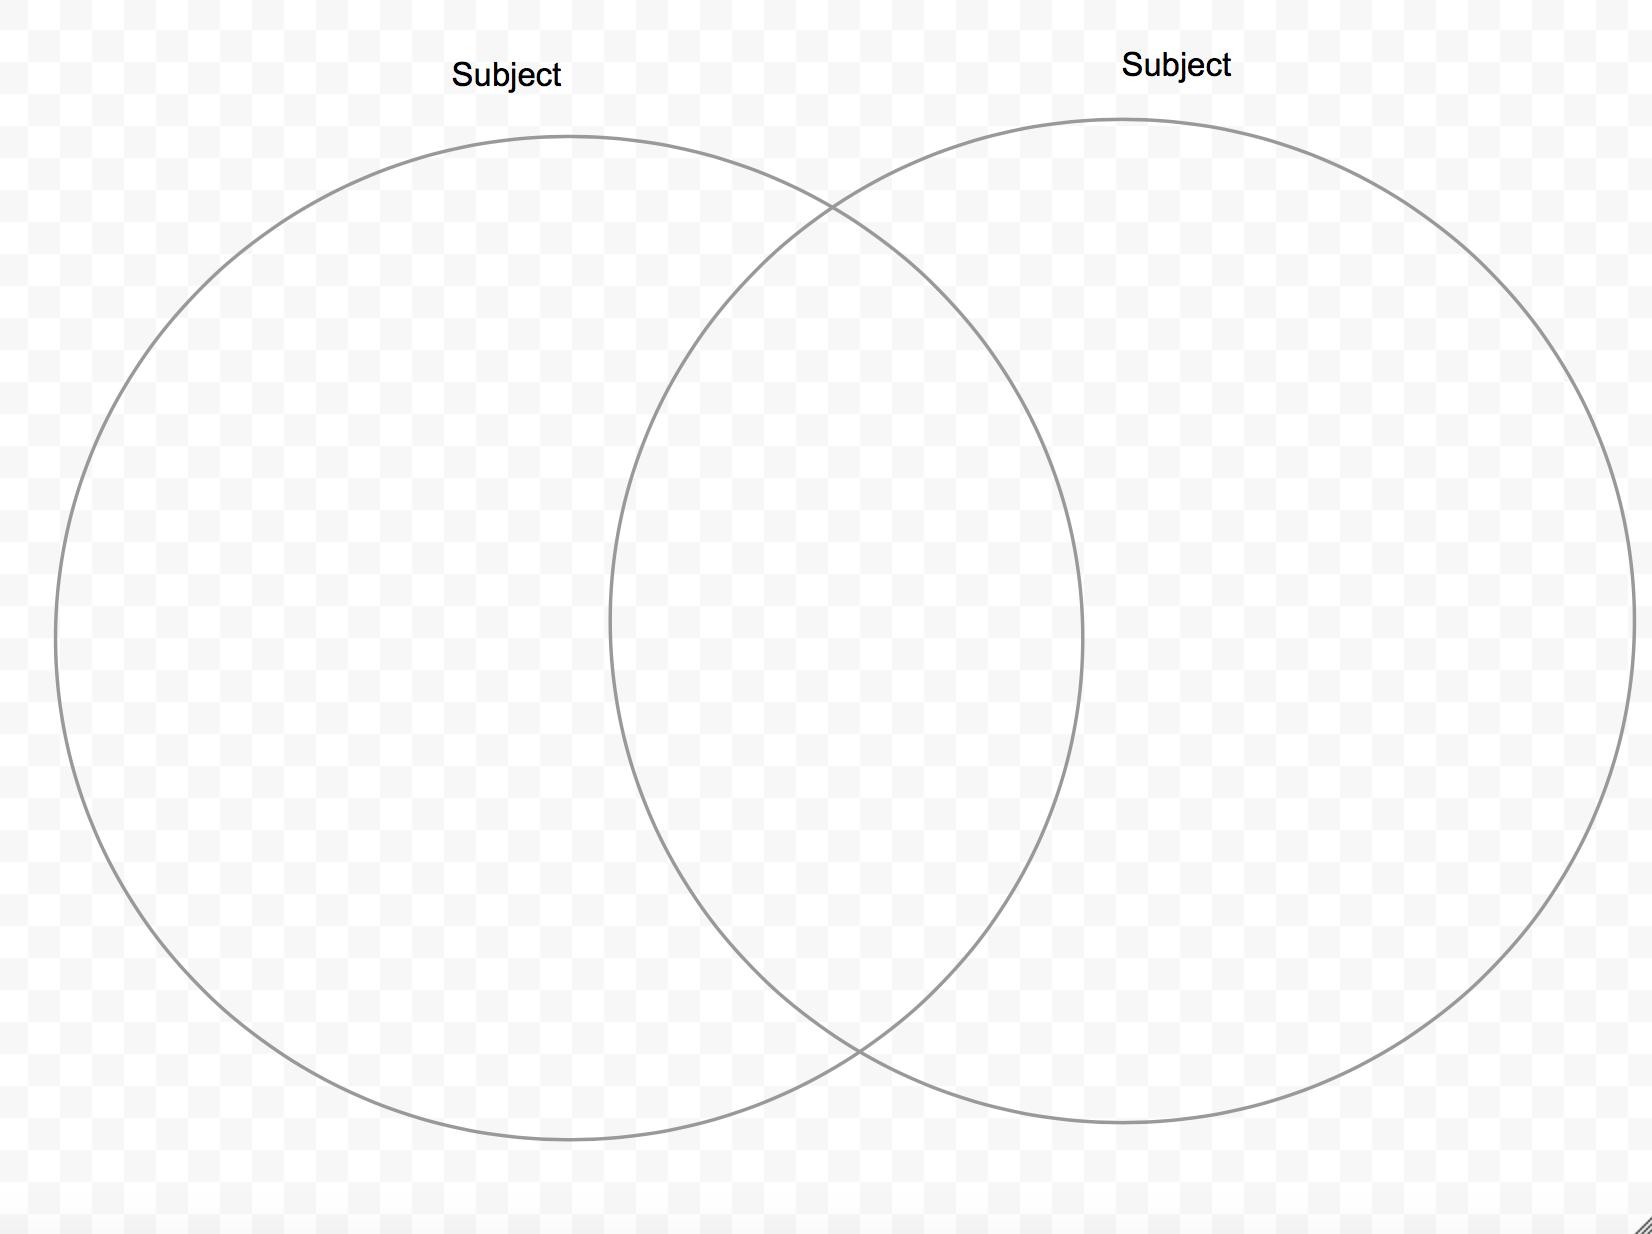 venn diagram graphic organizer cat 5 vs 6 8 editable templates for google apps